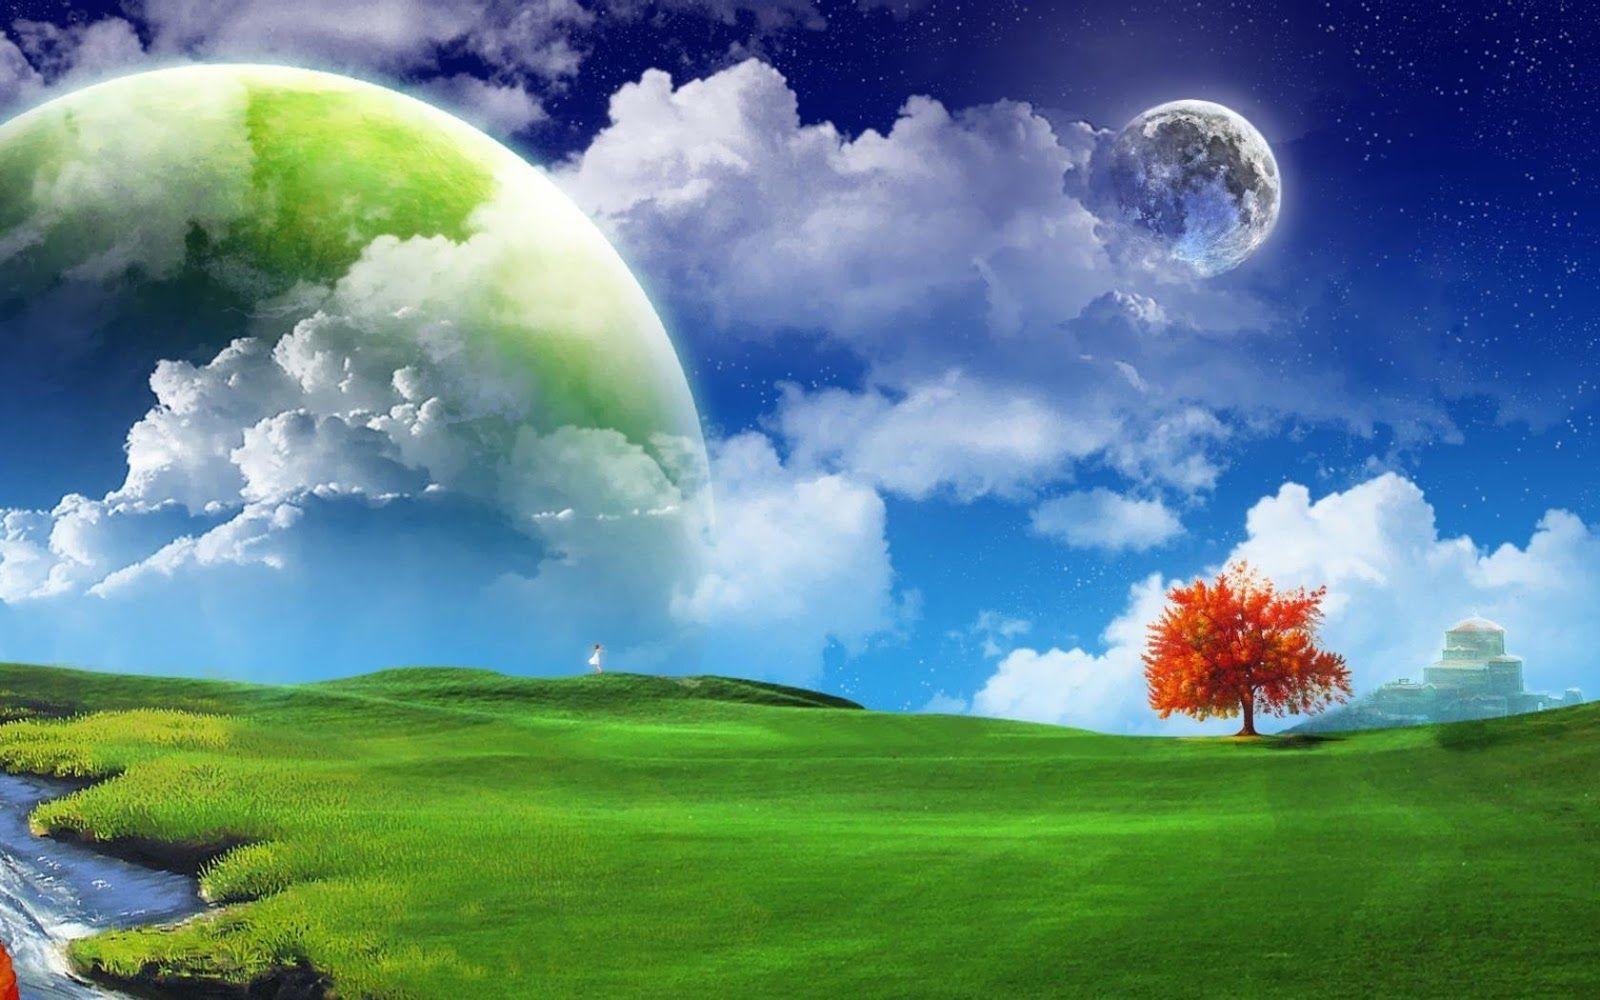 Very Most Beautiful Hd Wallpapers   Data-src /full/345731 - Most Beautiful Wallpapers In The World Nature - HD Wallpaper